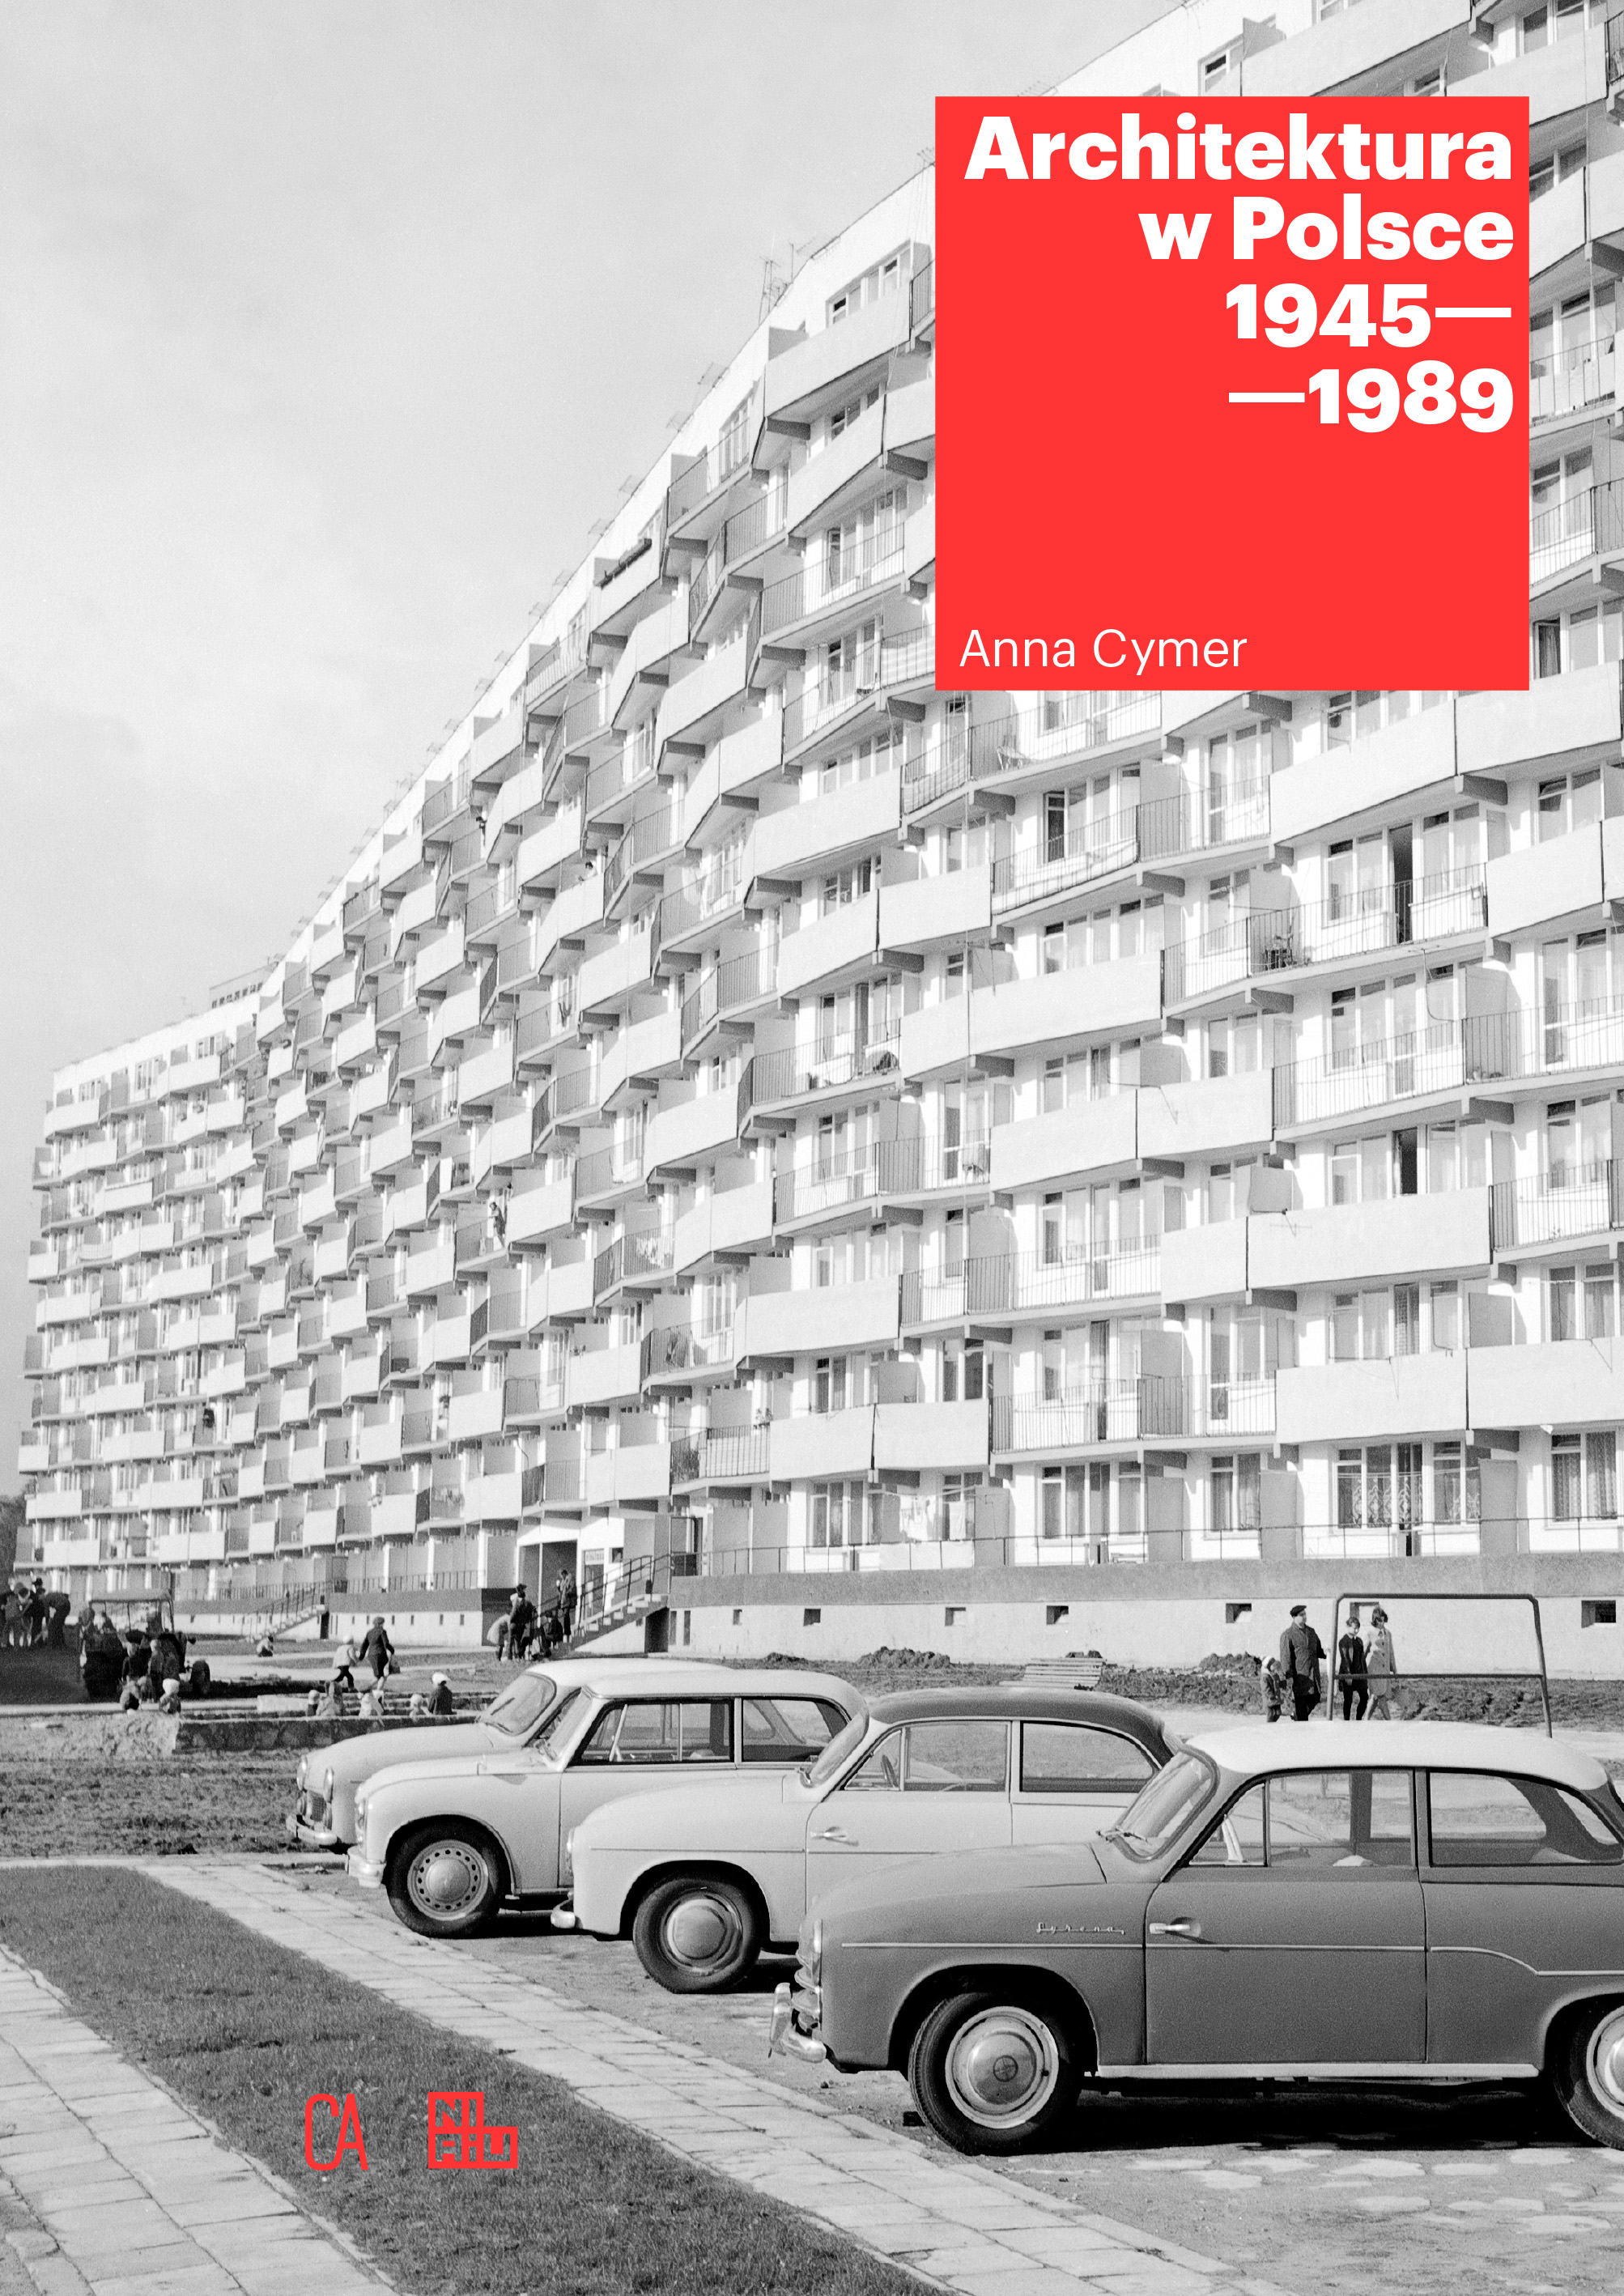 Architektura w Polsce 1945-1989 (A.Cymer)